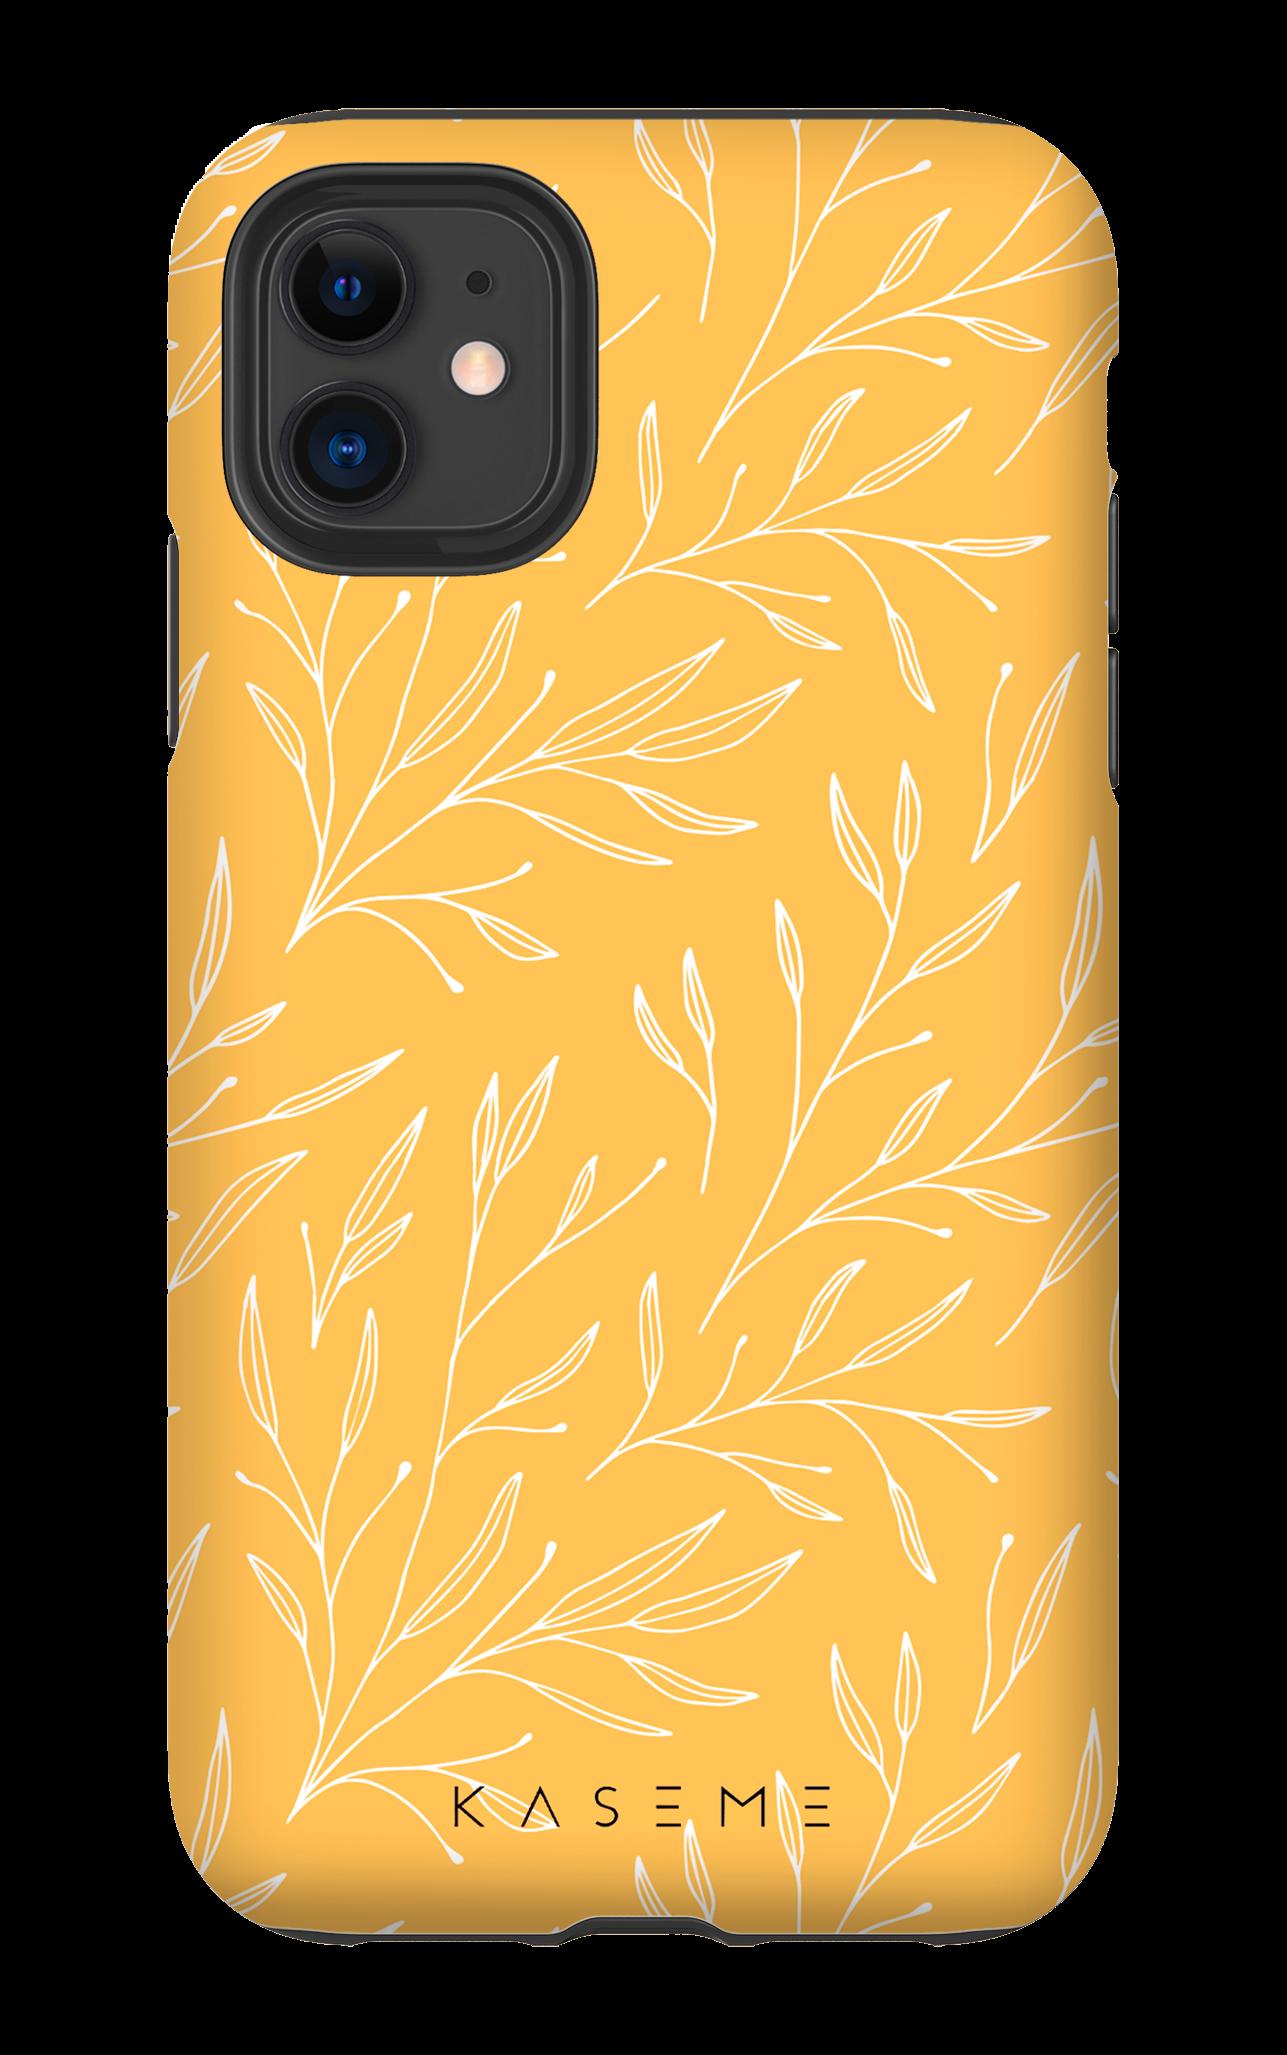 Freesia Wild phone case